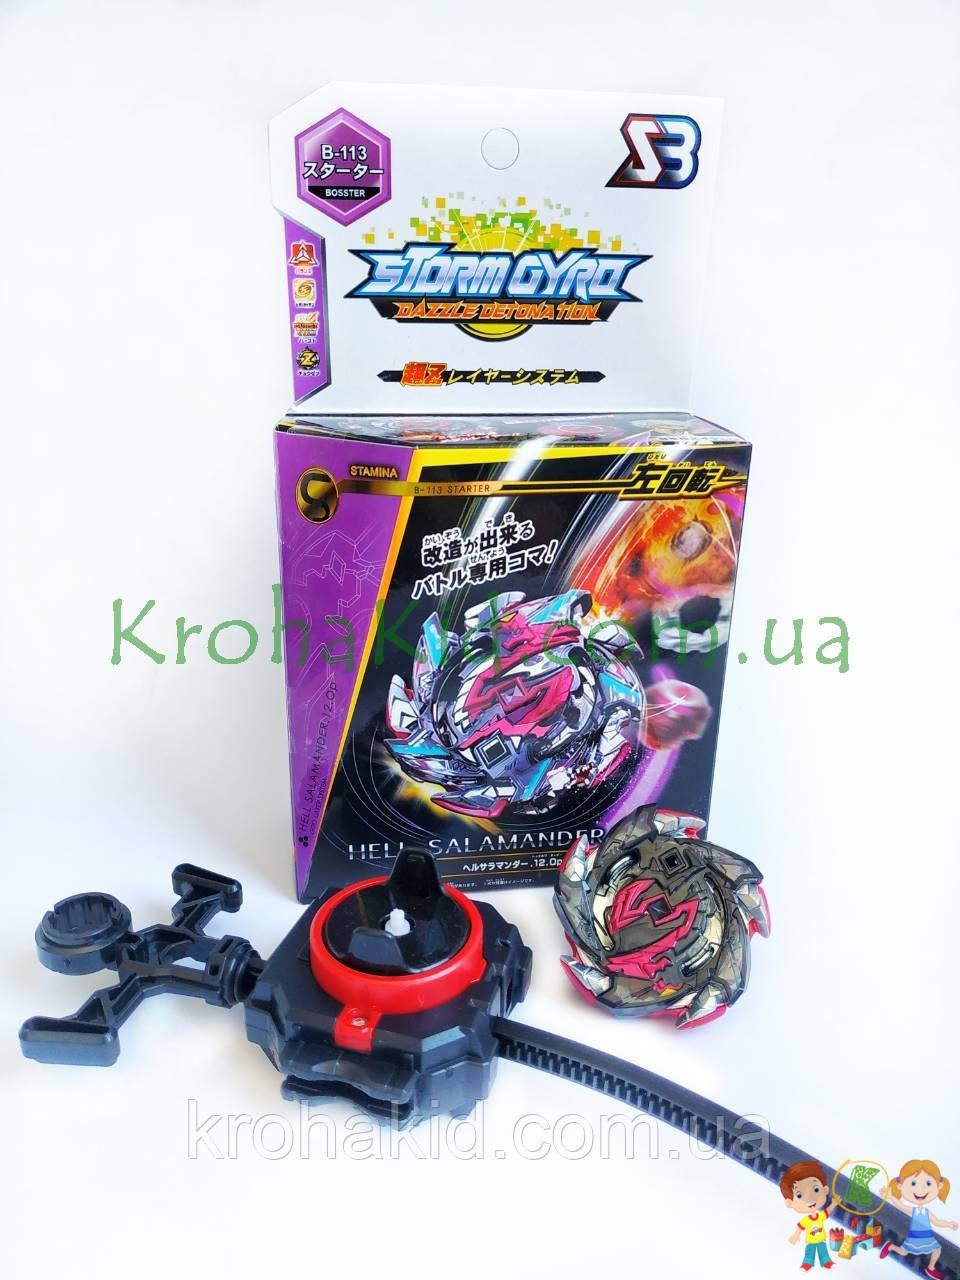 BeyBlade Hell Salamander B-113 / Бейблэйд Адская Саламандра (черный с фиолетовым) SB